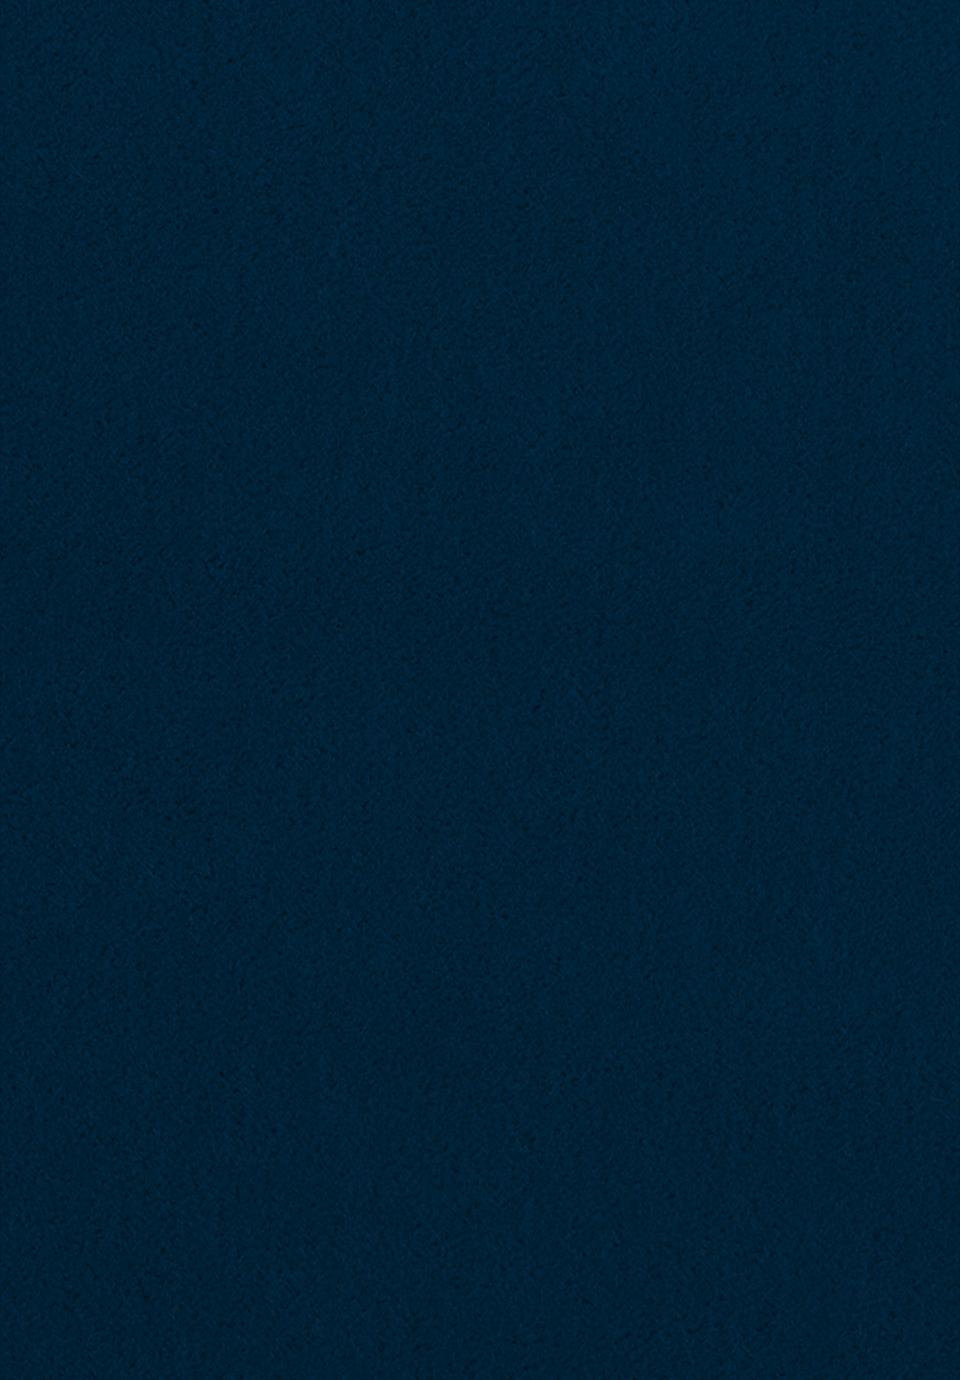 MOHAIR NIGHT BLUE